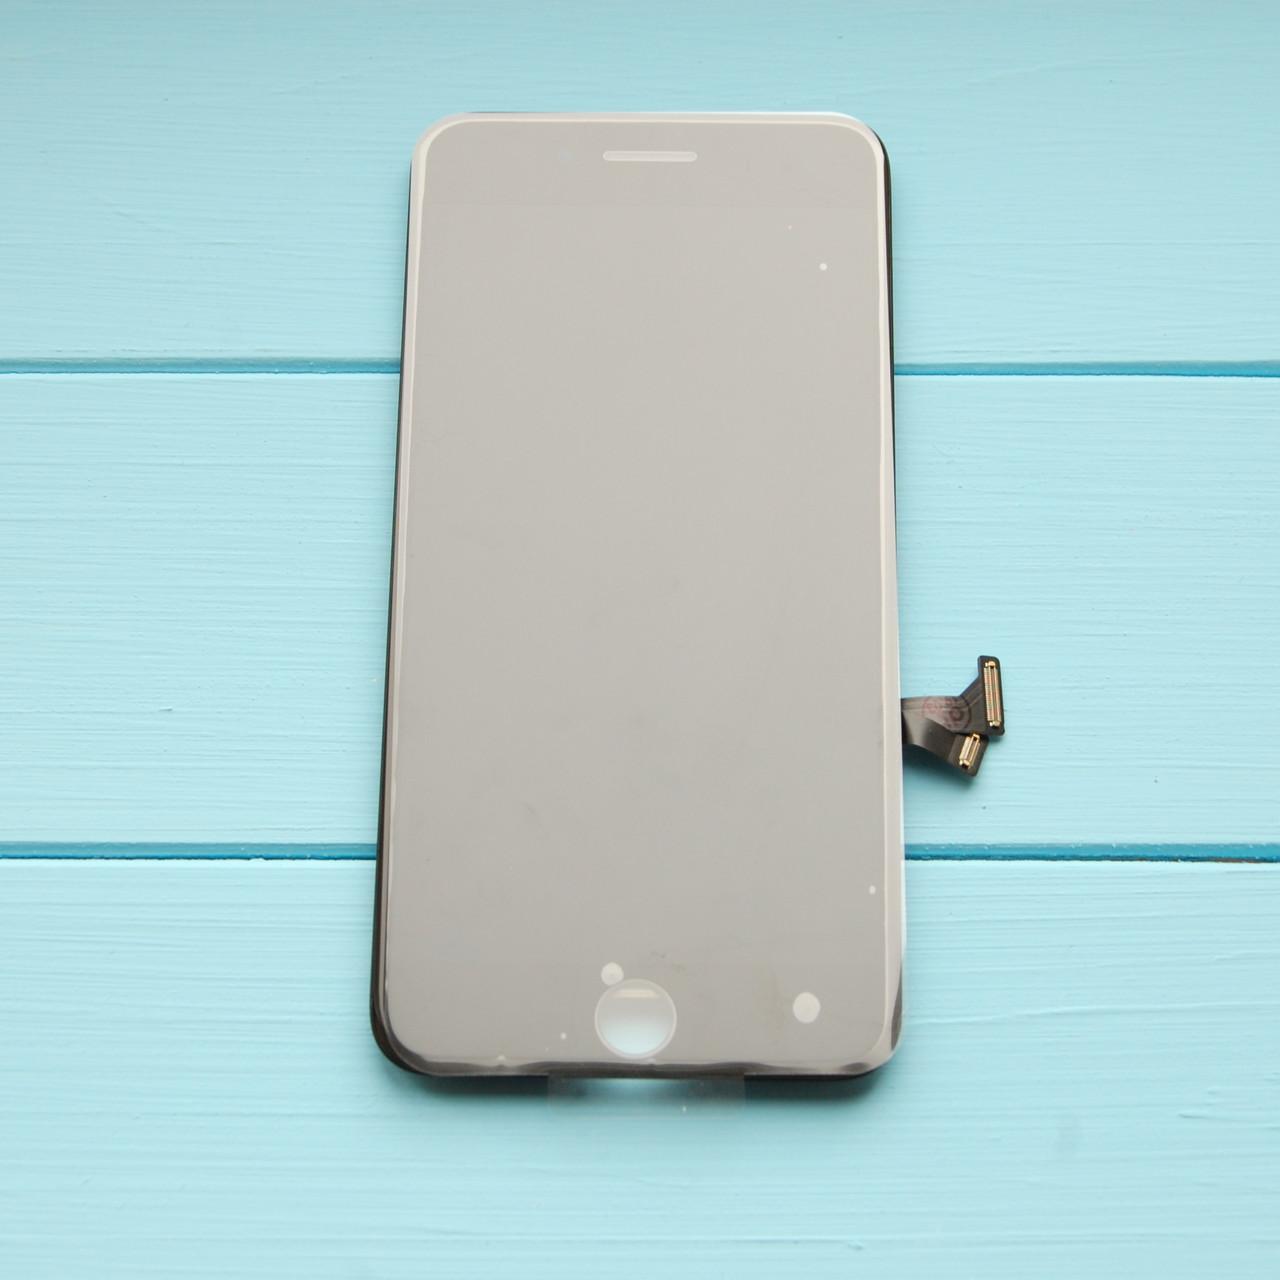 Дисплейный модуль Apple iPhone 7 Plus Оригинал Black